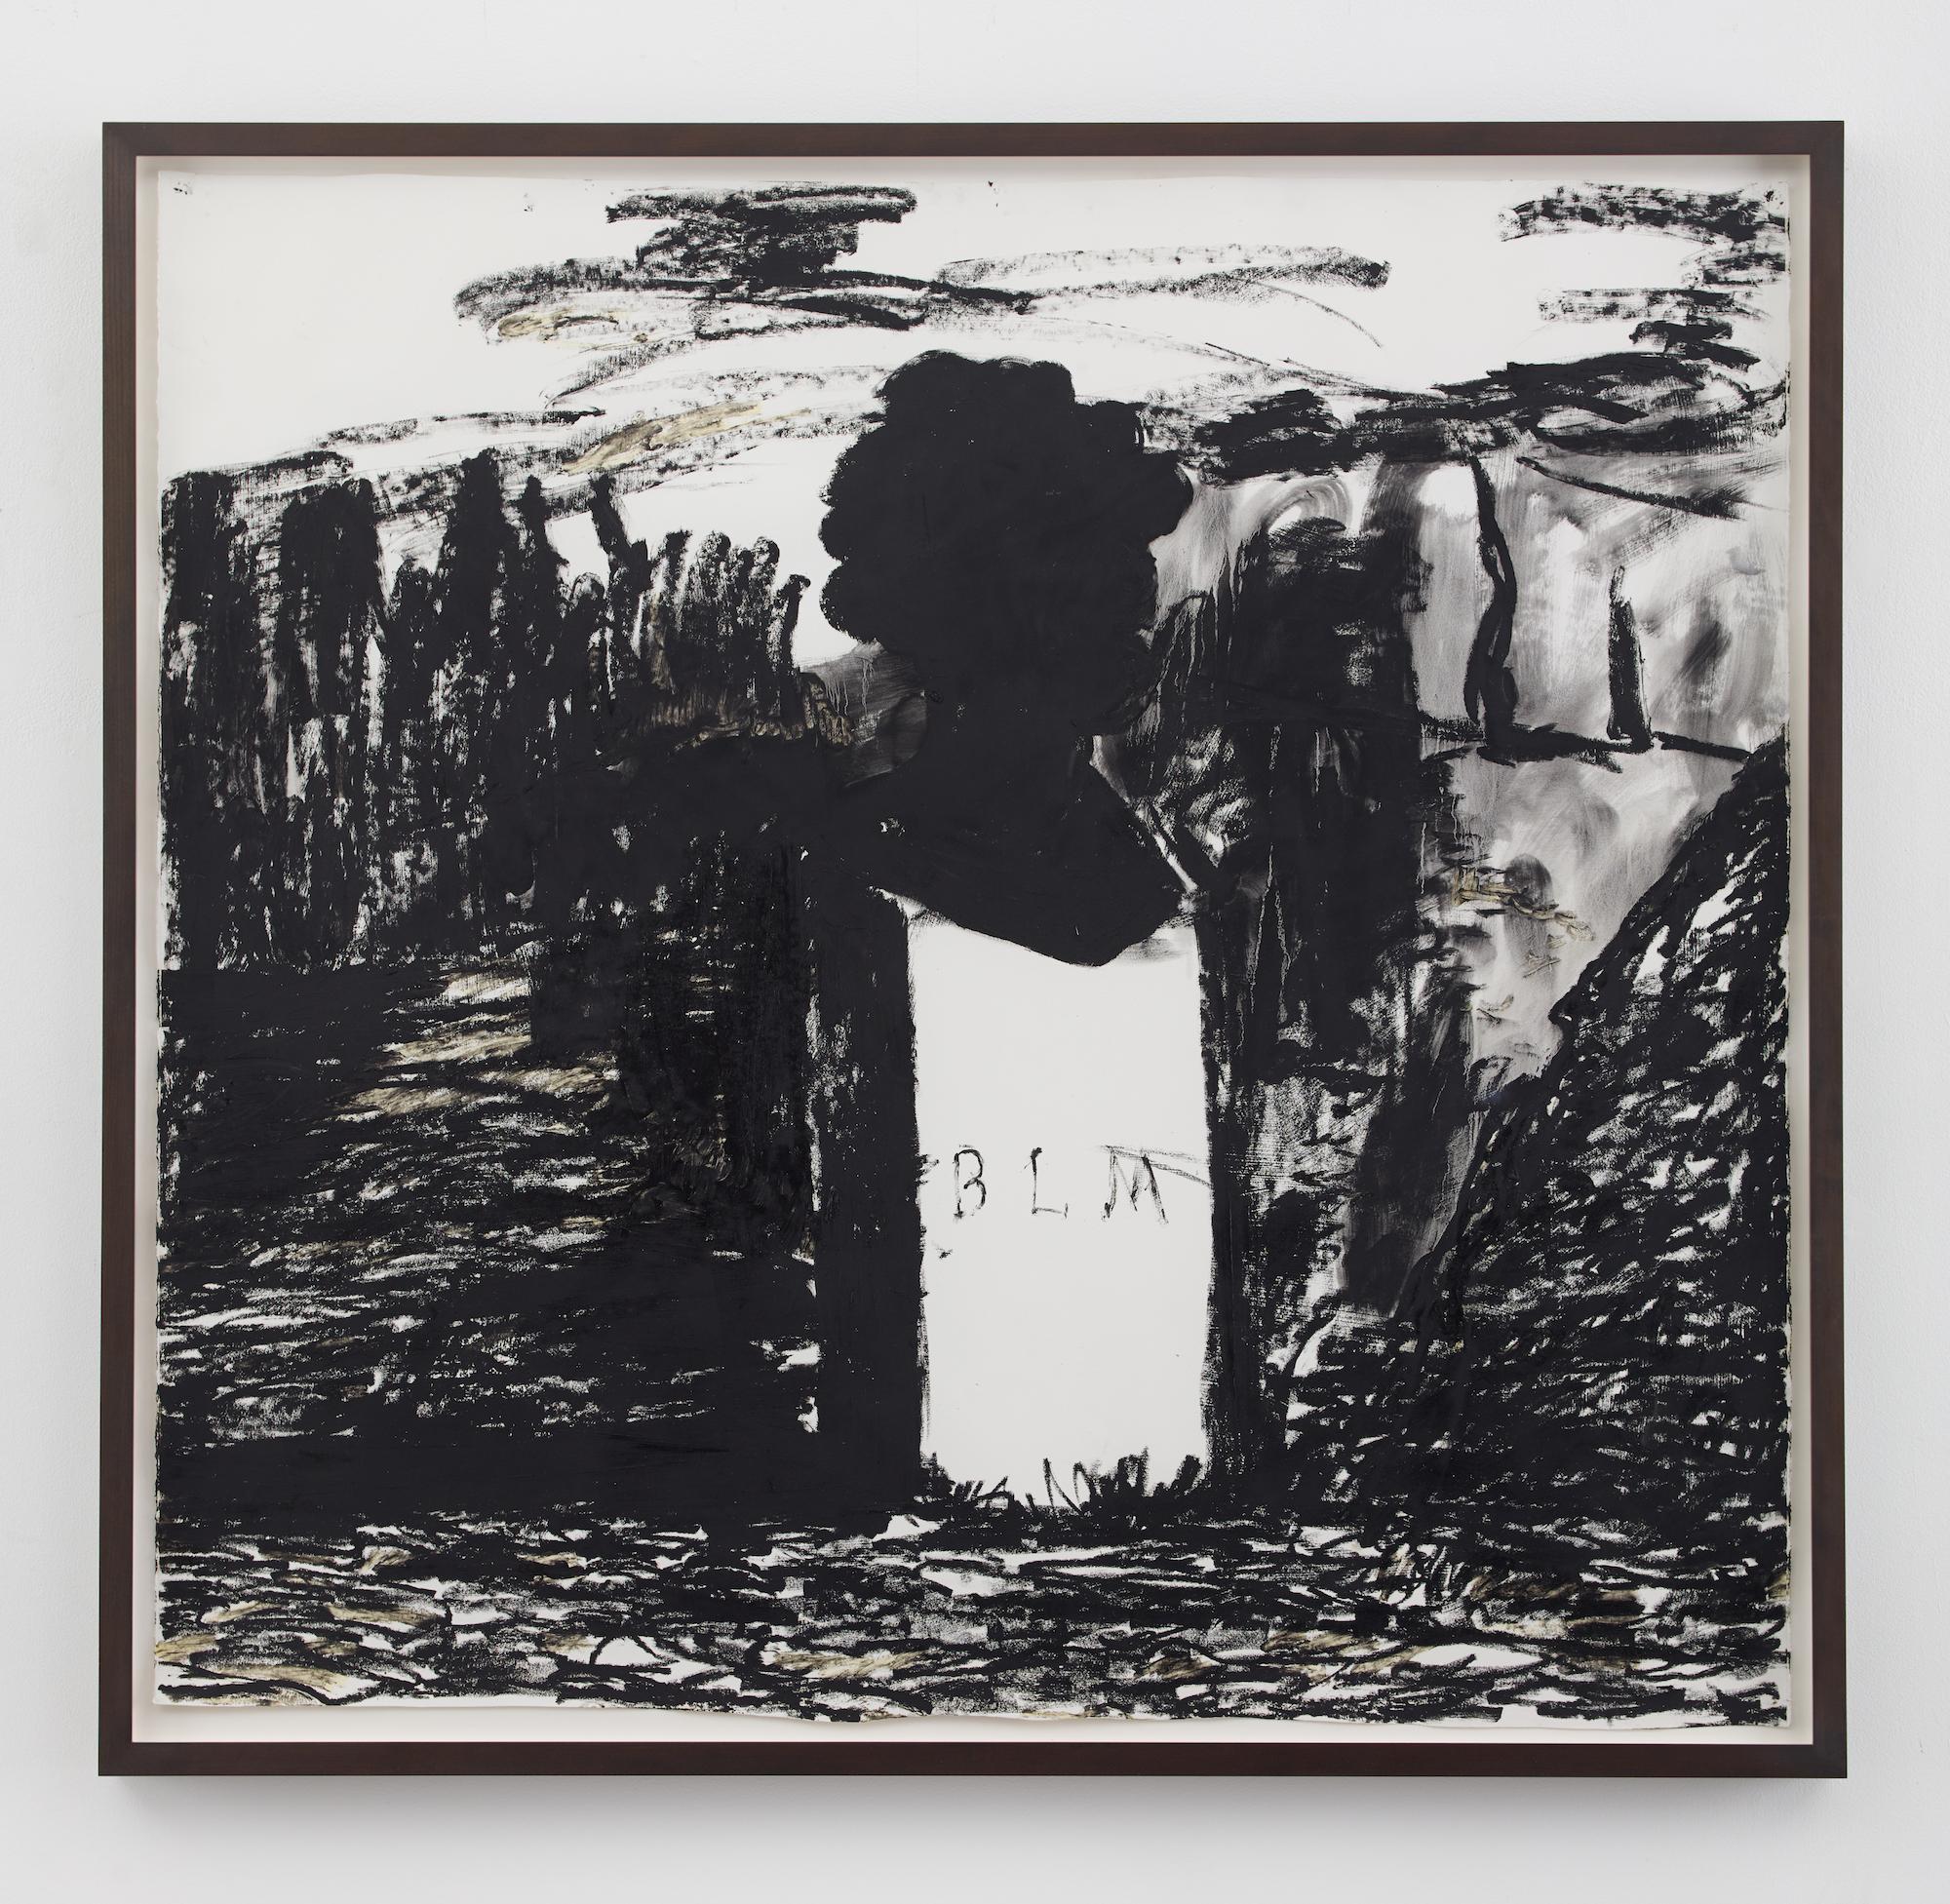 Kara Walker, BLM , 2016. Oil stick on paper, 57.5 x 60.5 inches.